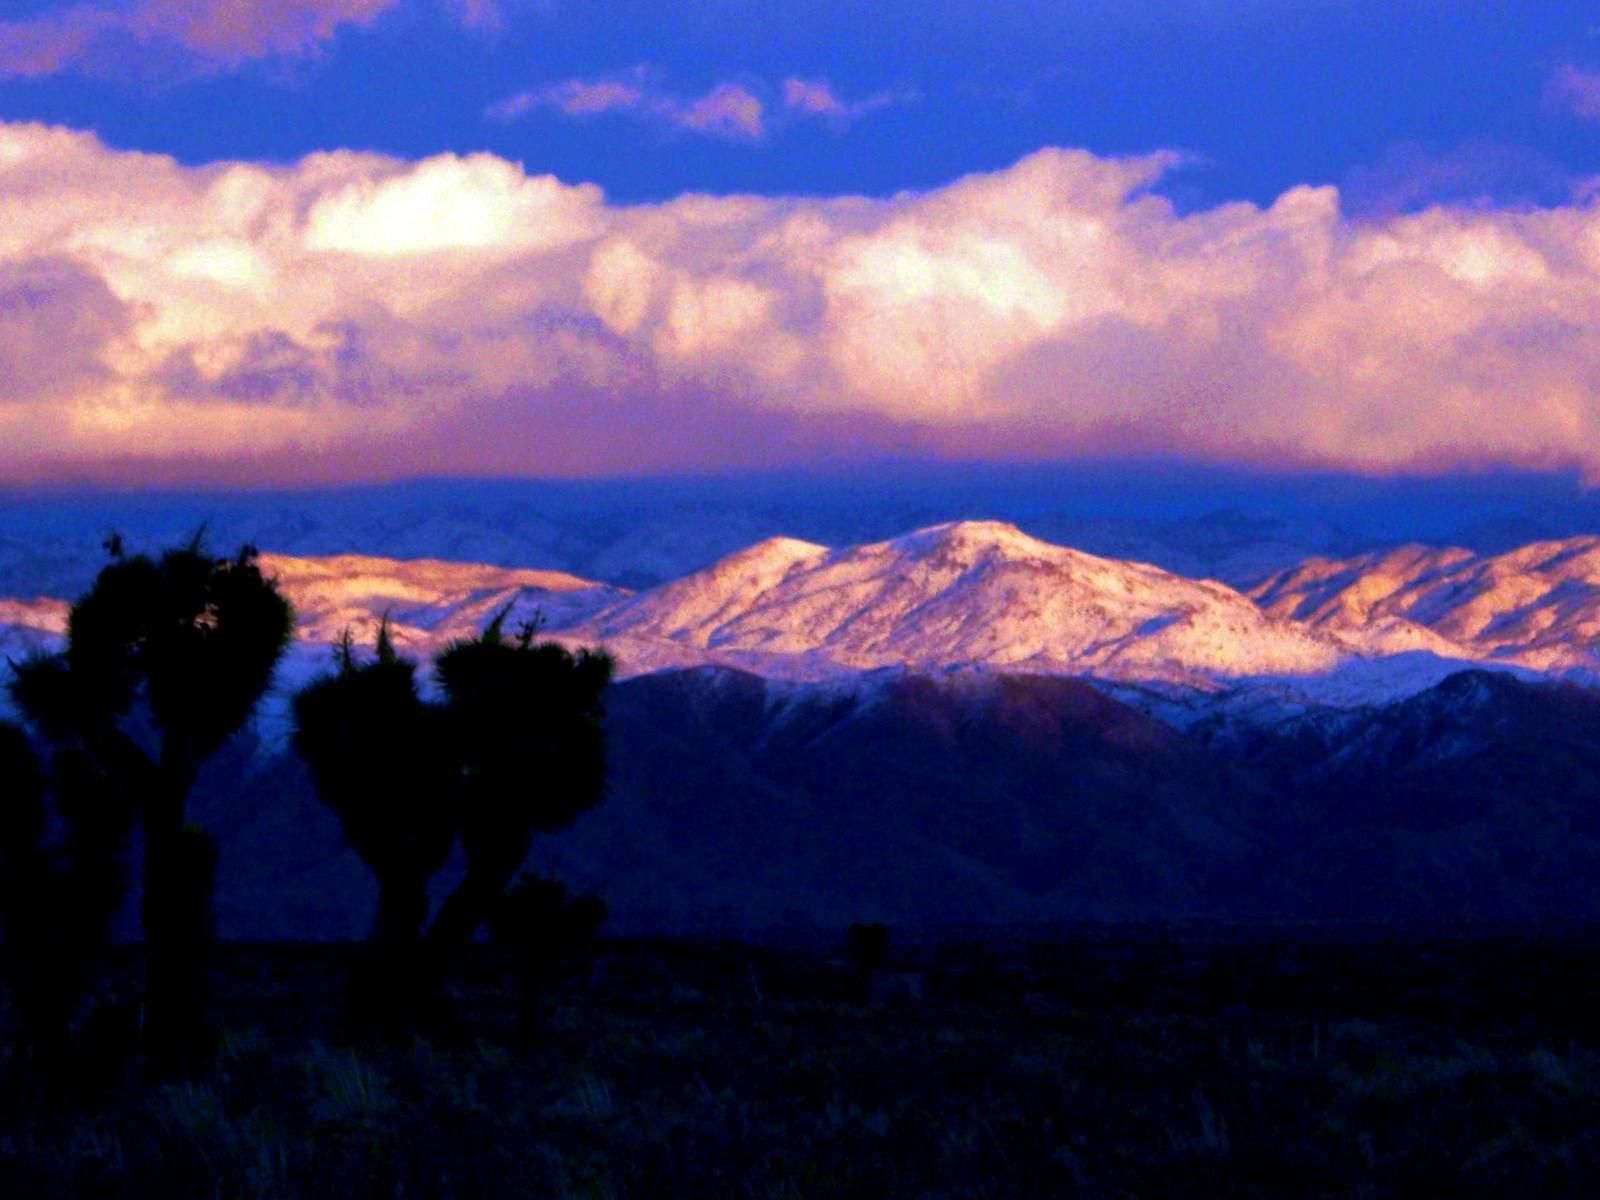 san bernardino national forest, california, mountains